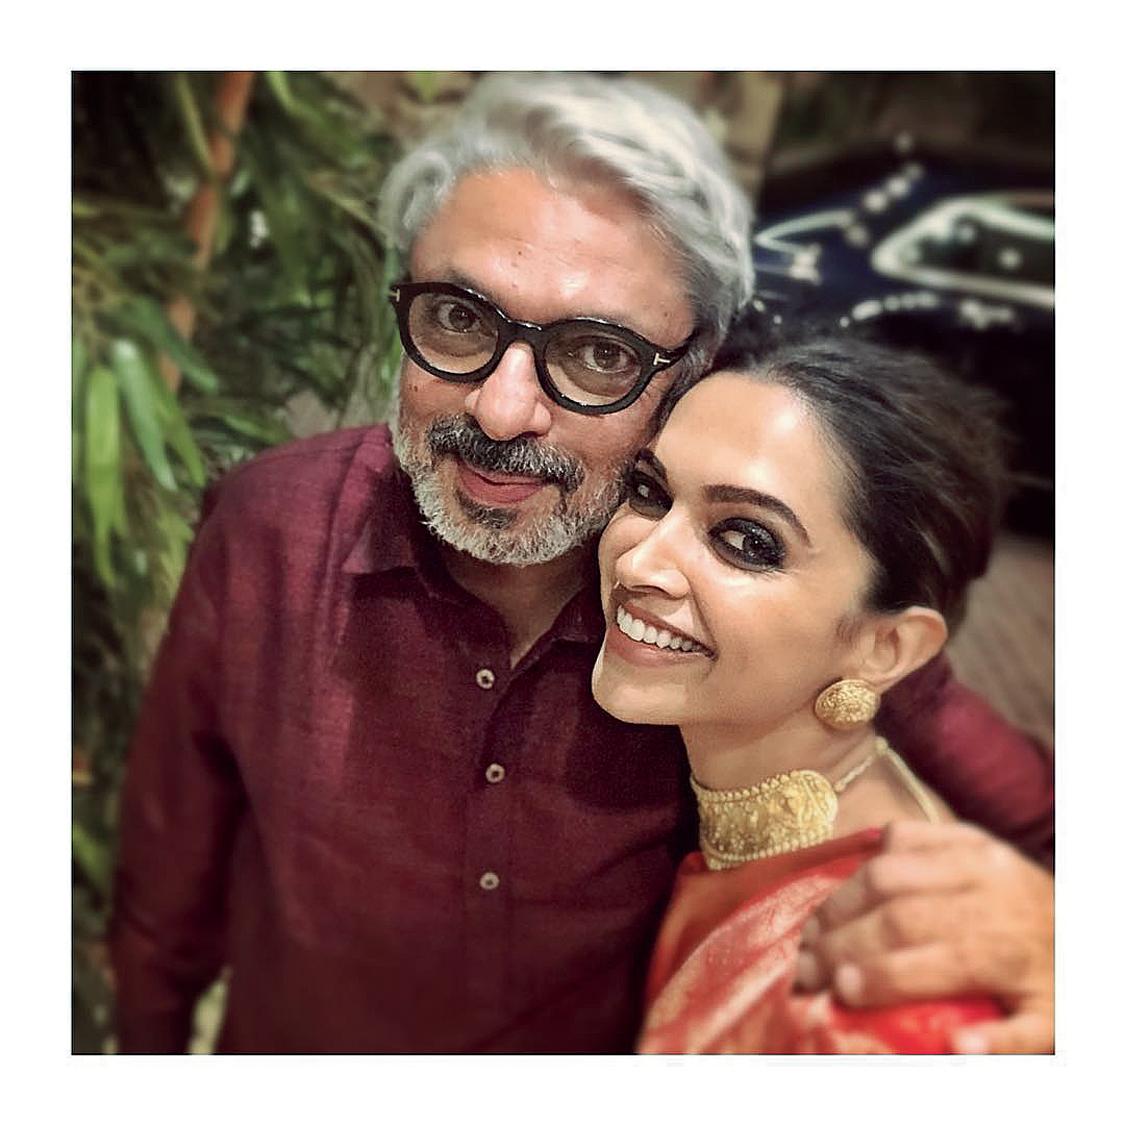 Sanjay Leela Bhansali with Deepika Padukone, who has starred in his last three films